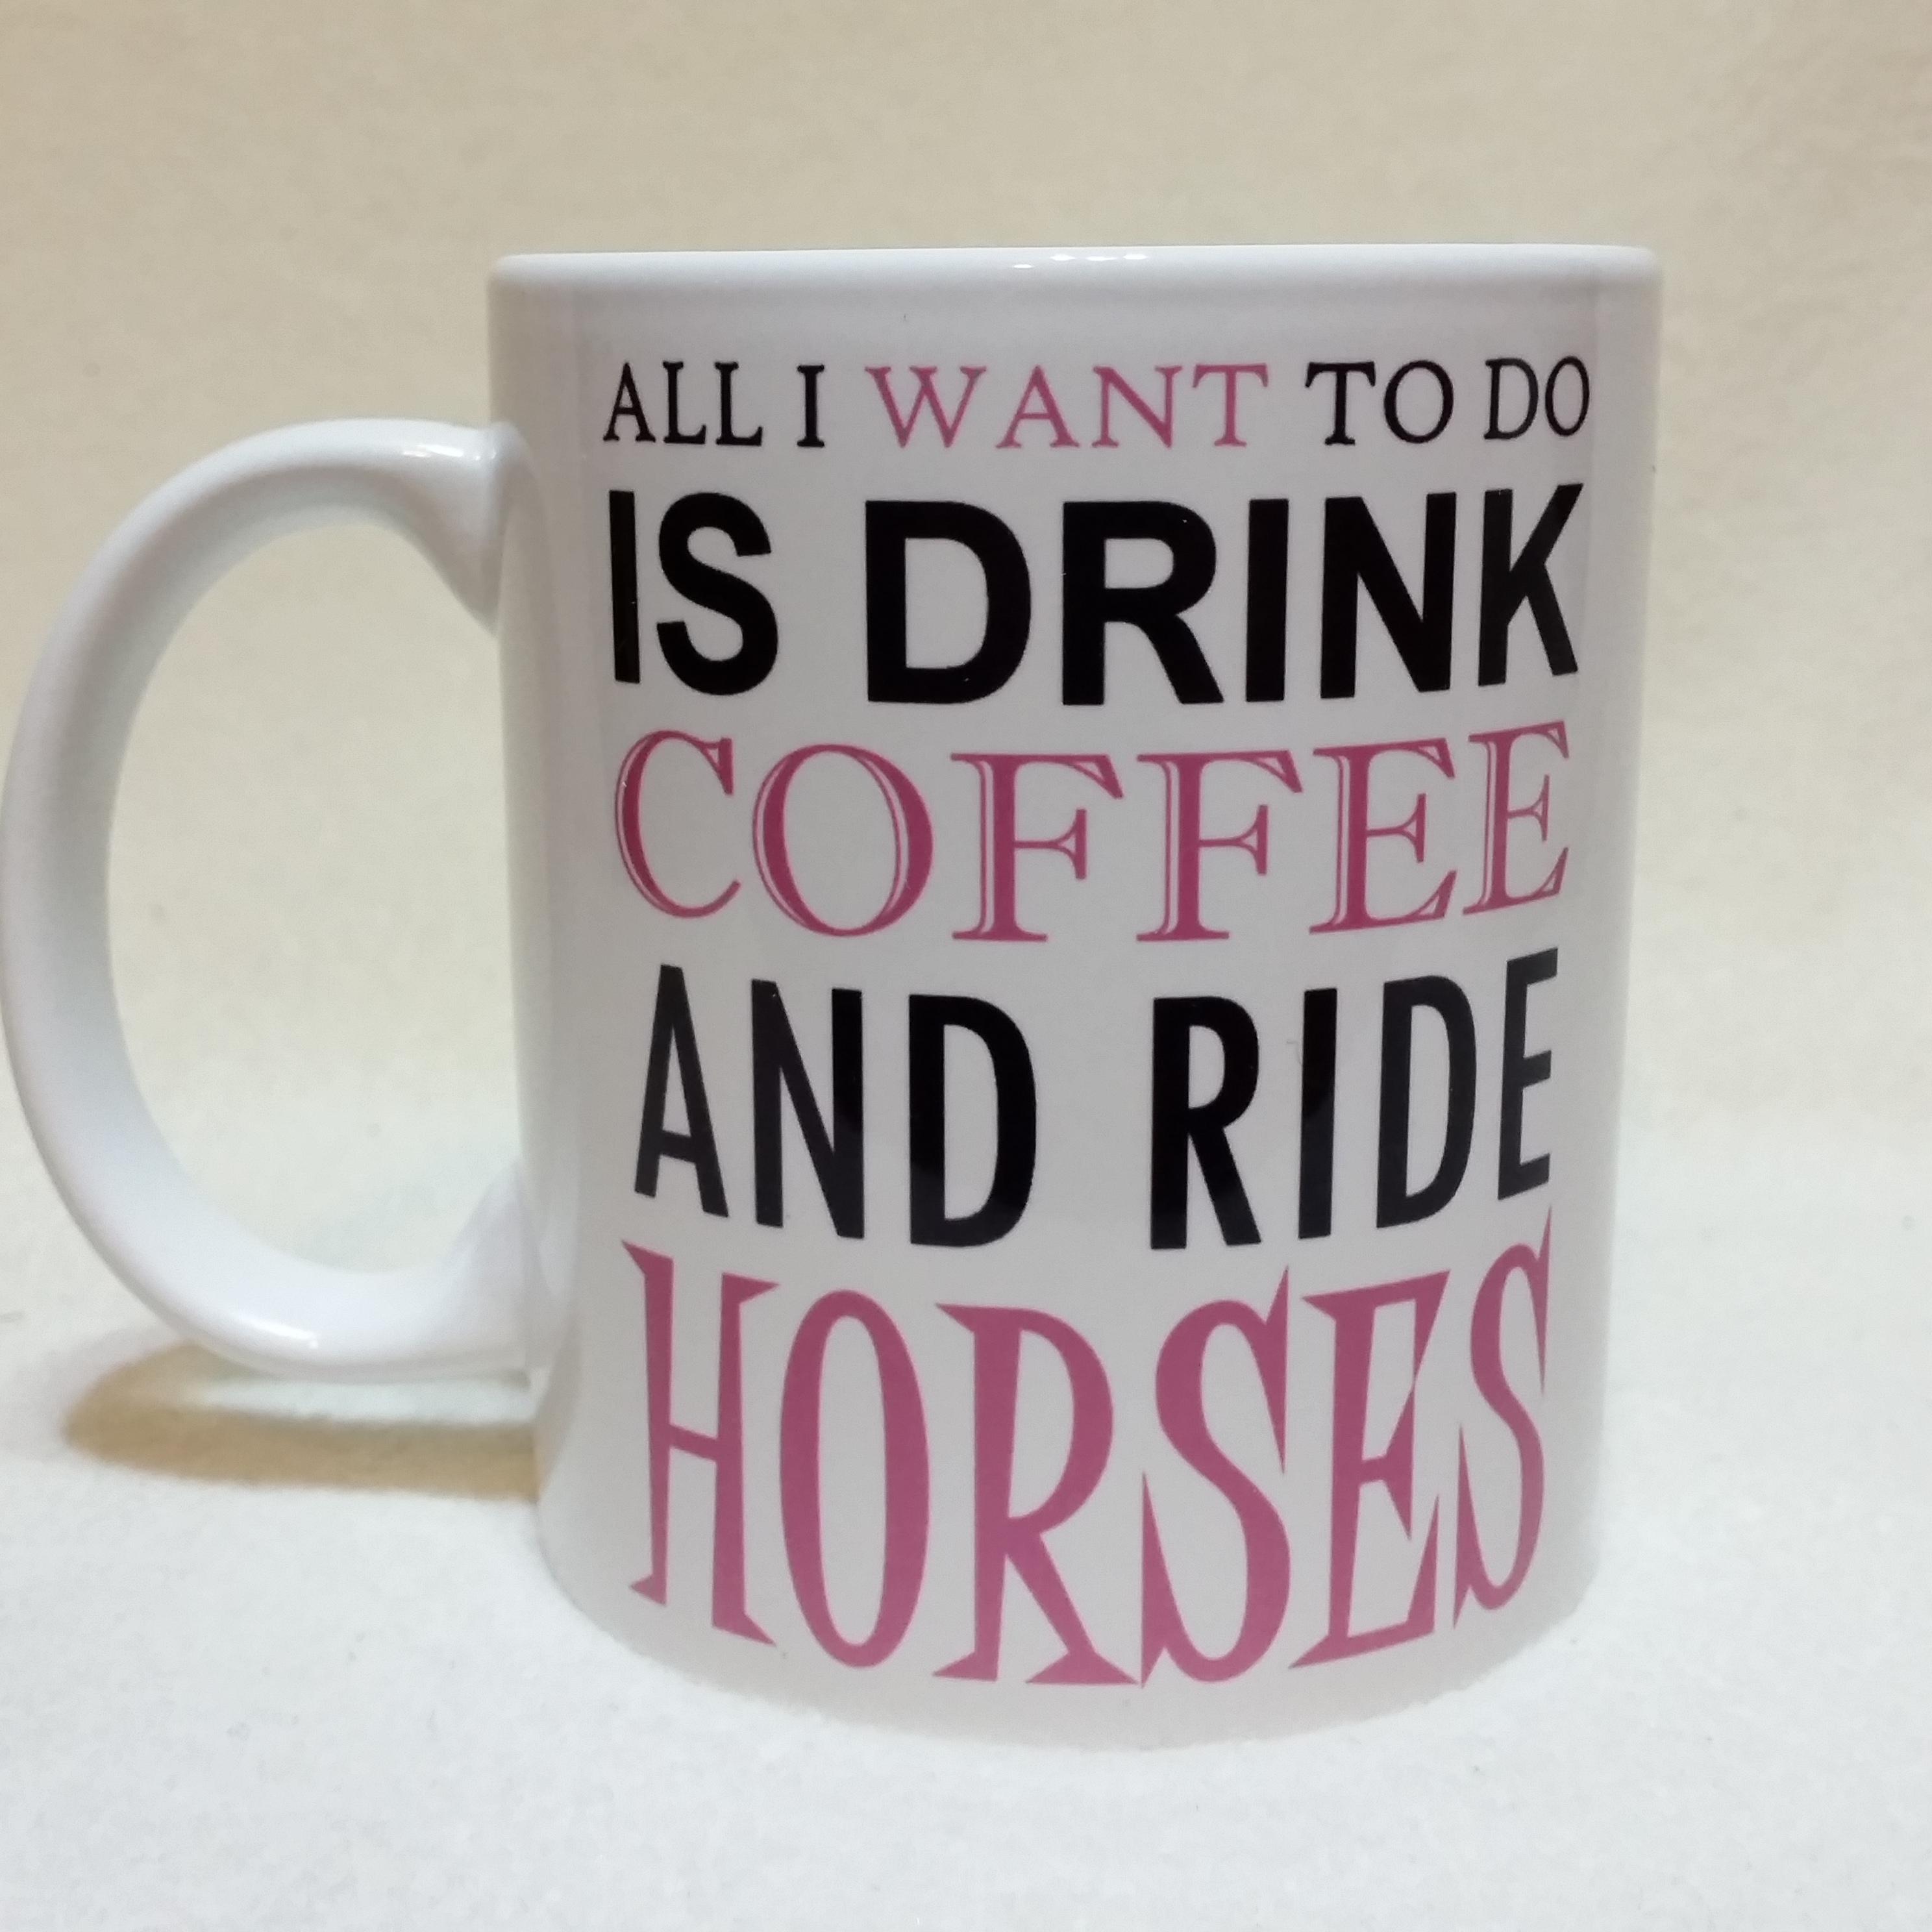 Mug Funny Ride Horses Horse Coffee Drink And fmYI76ybgv